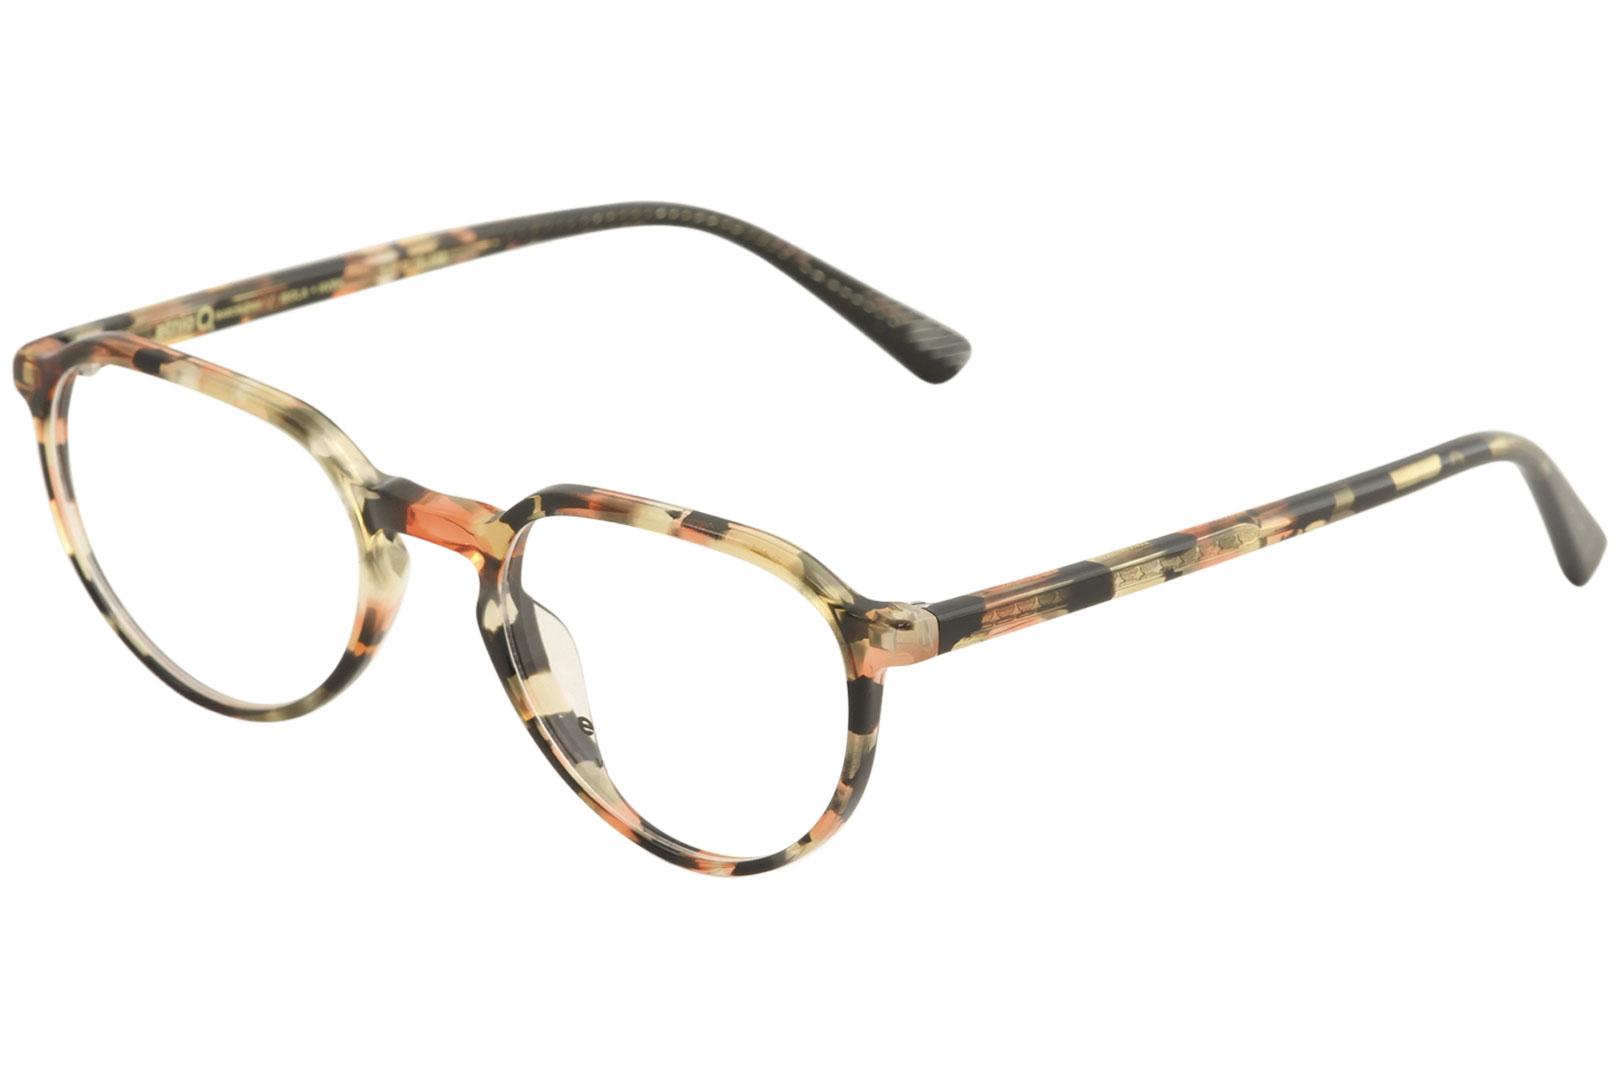 3944bd4a06 Details about Etnia Barcelona Women s Eyeglasses Isola HVBK Havana Black  Optical Frame 47mm